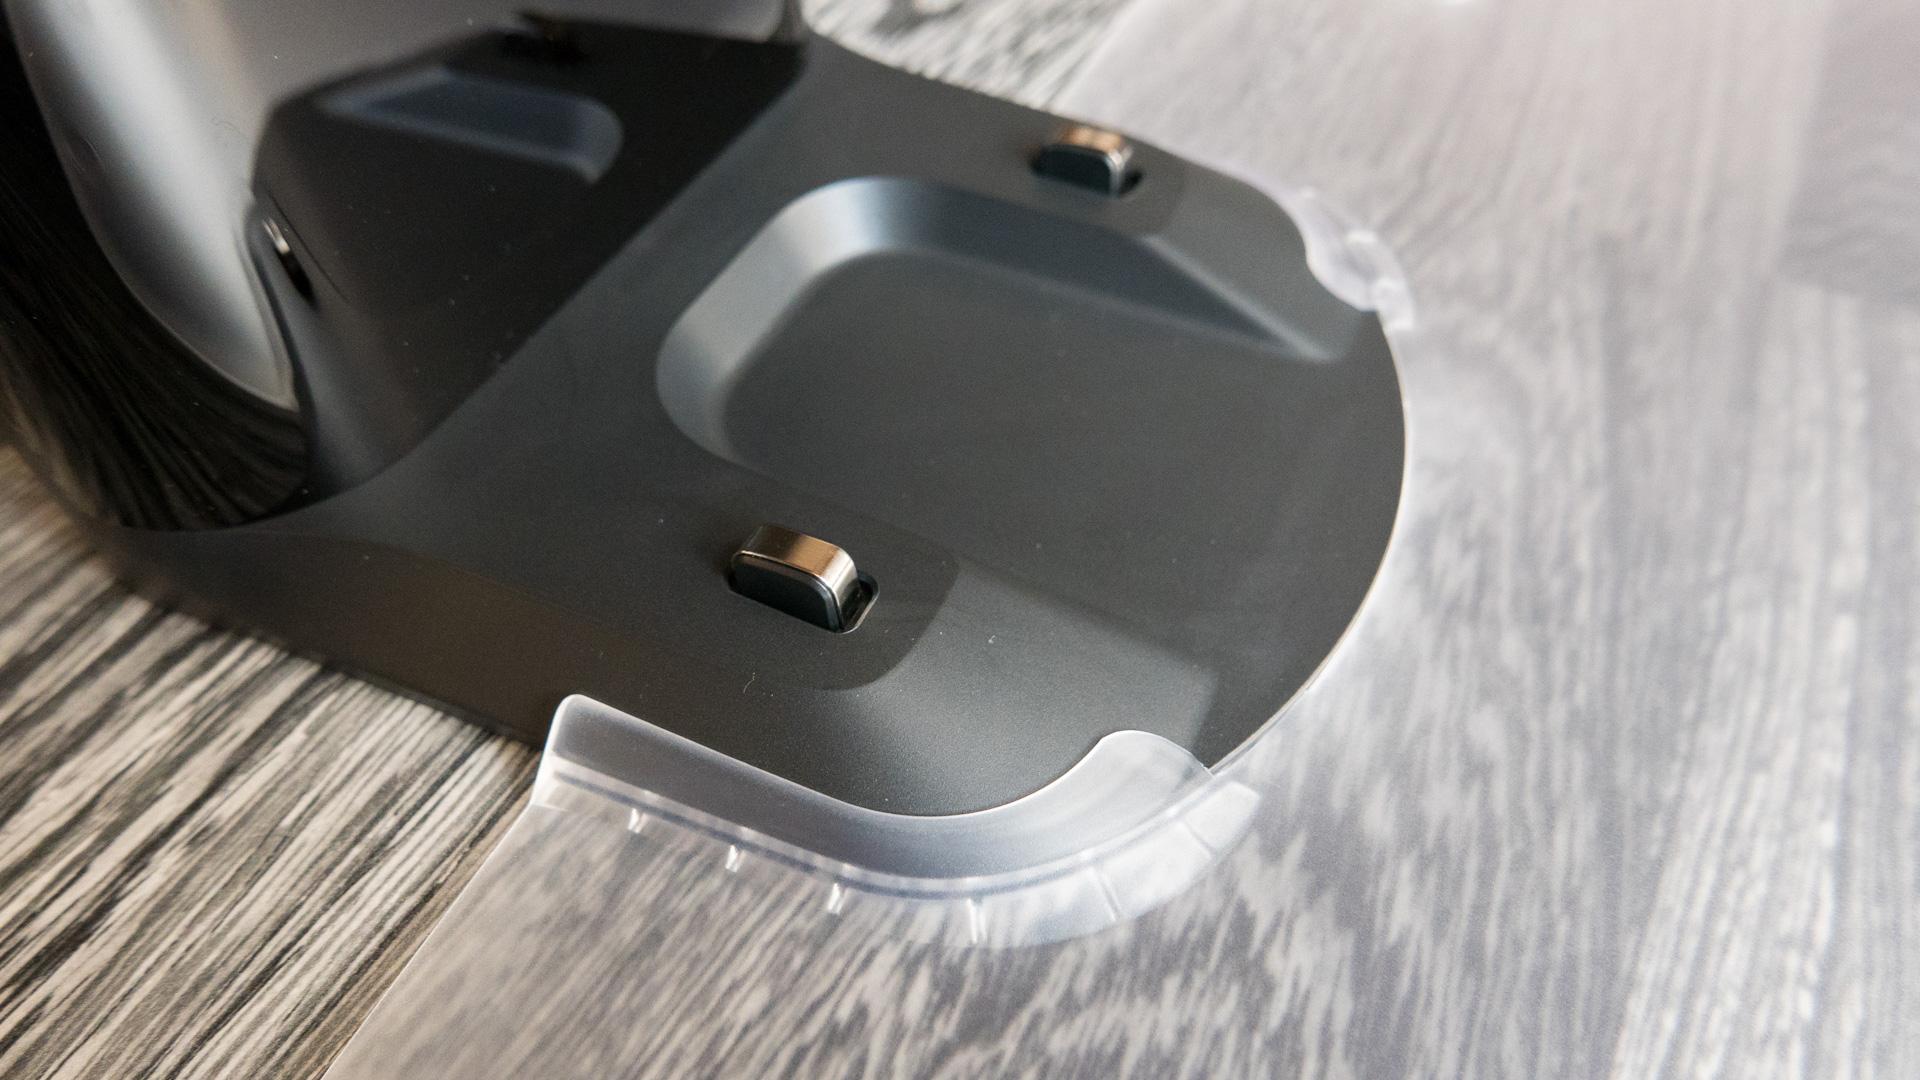 Xiaomi-roborock-S55-Ladestation-11